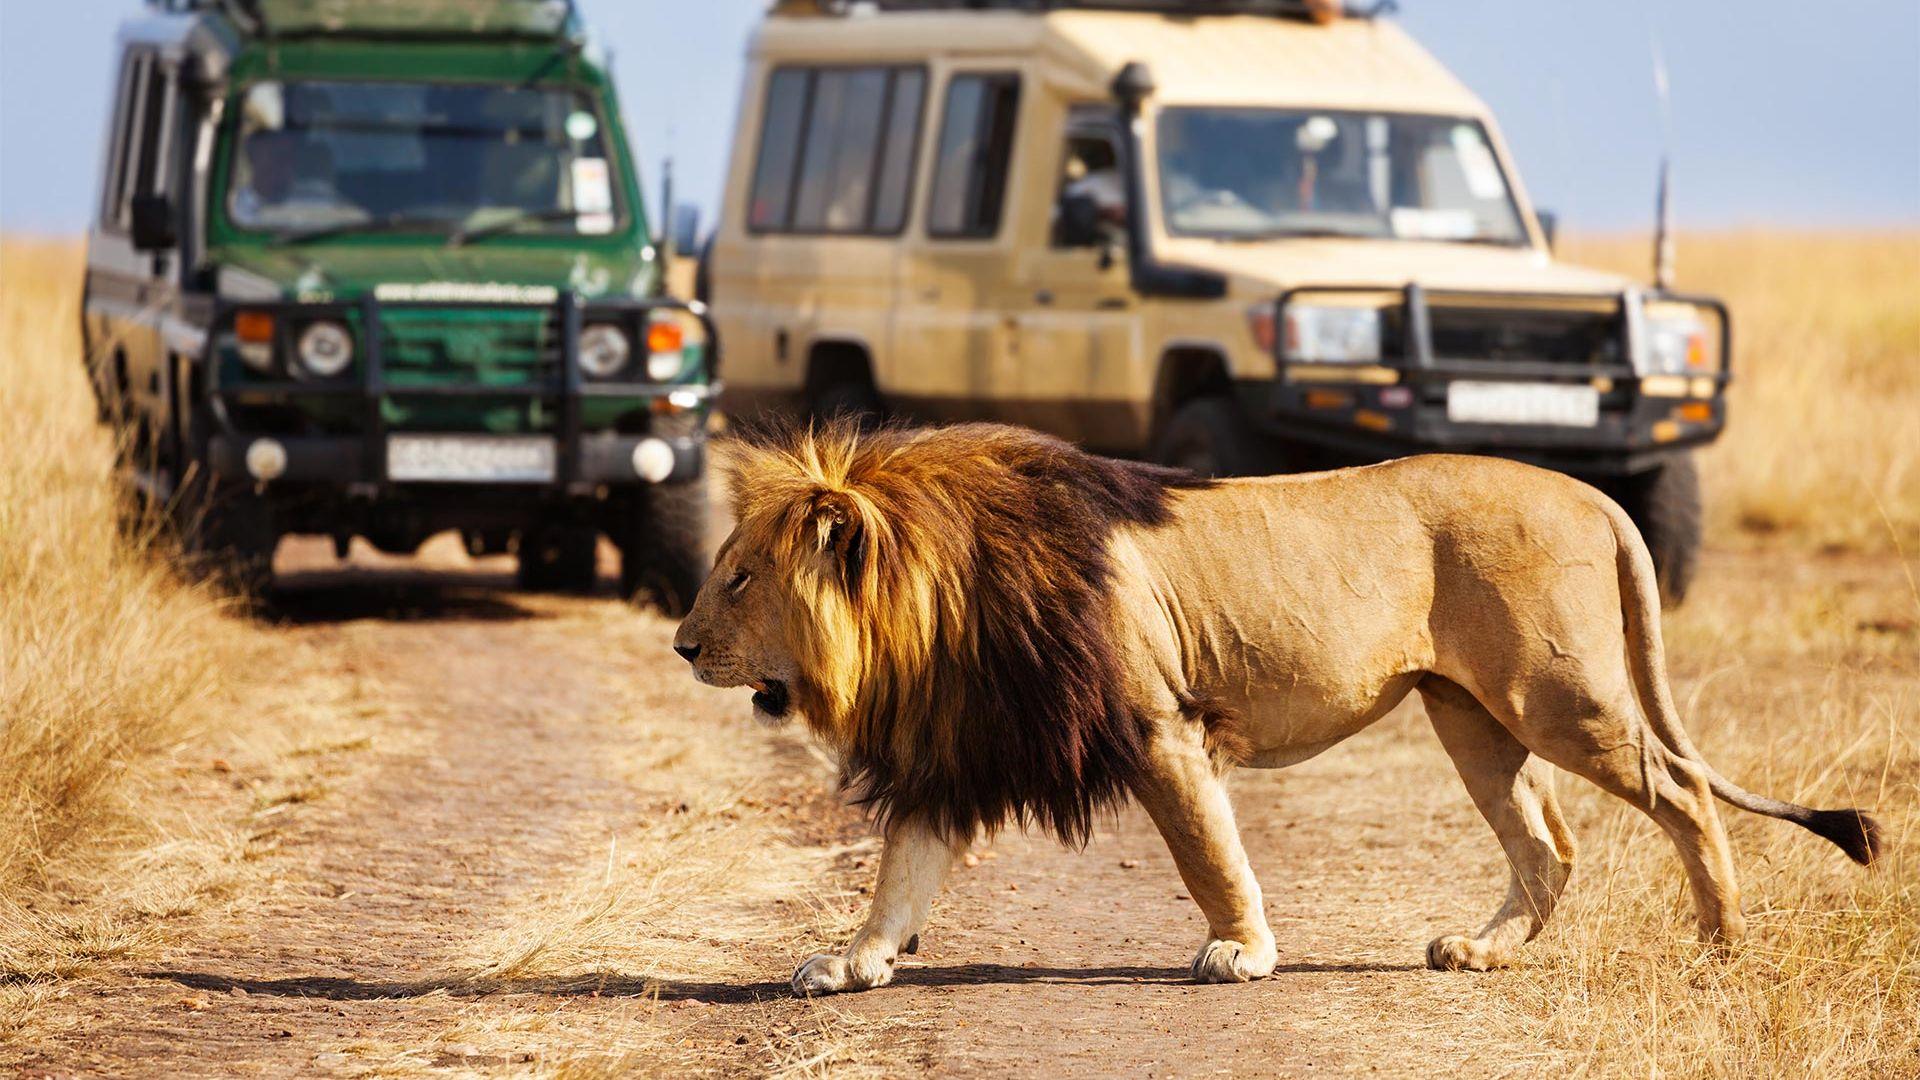 Share a trip Kenya, safari Marea Migratie & Diani Beach, 8 zile - 05 iulie 2021